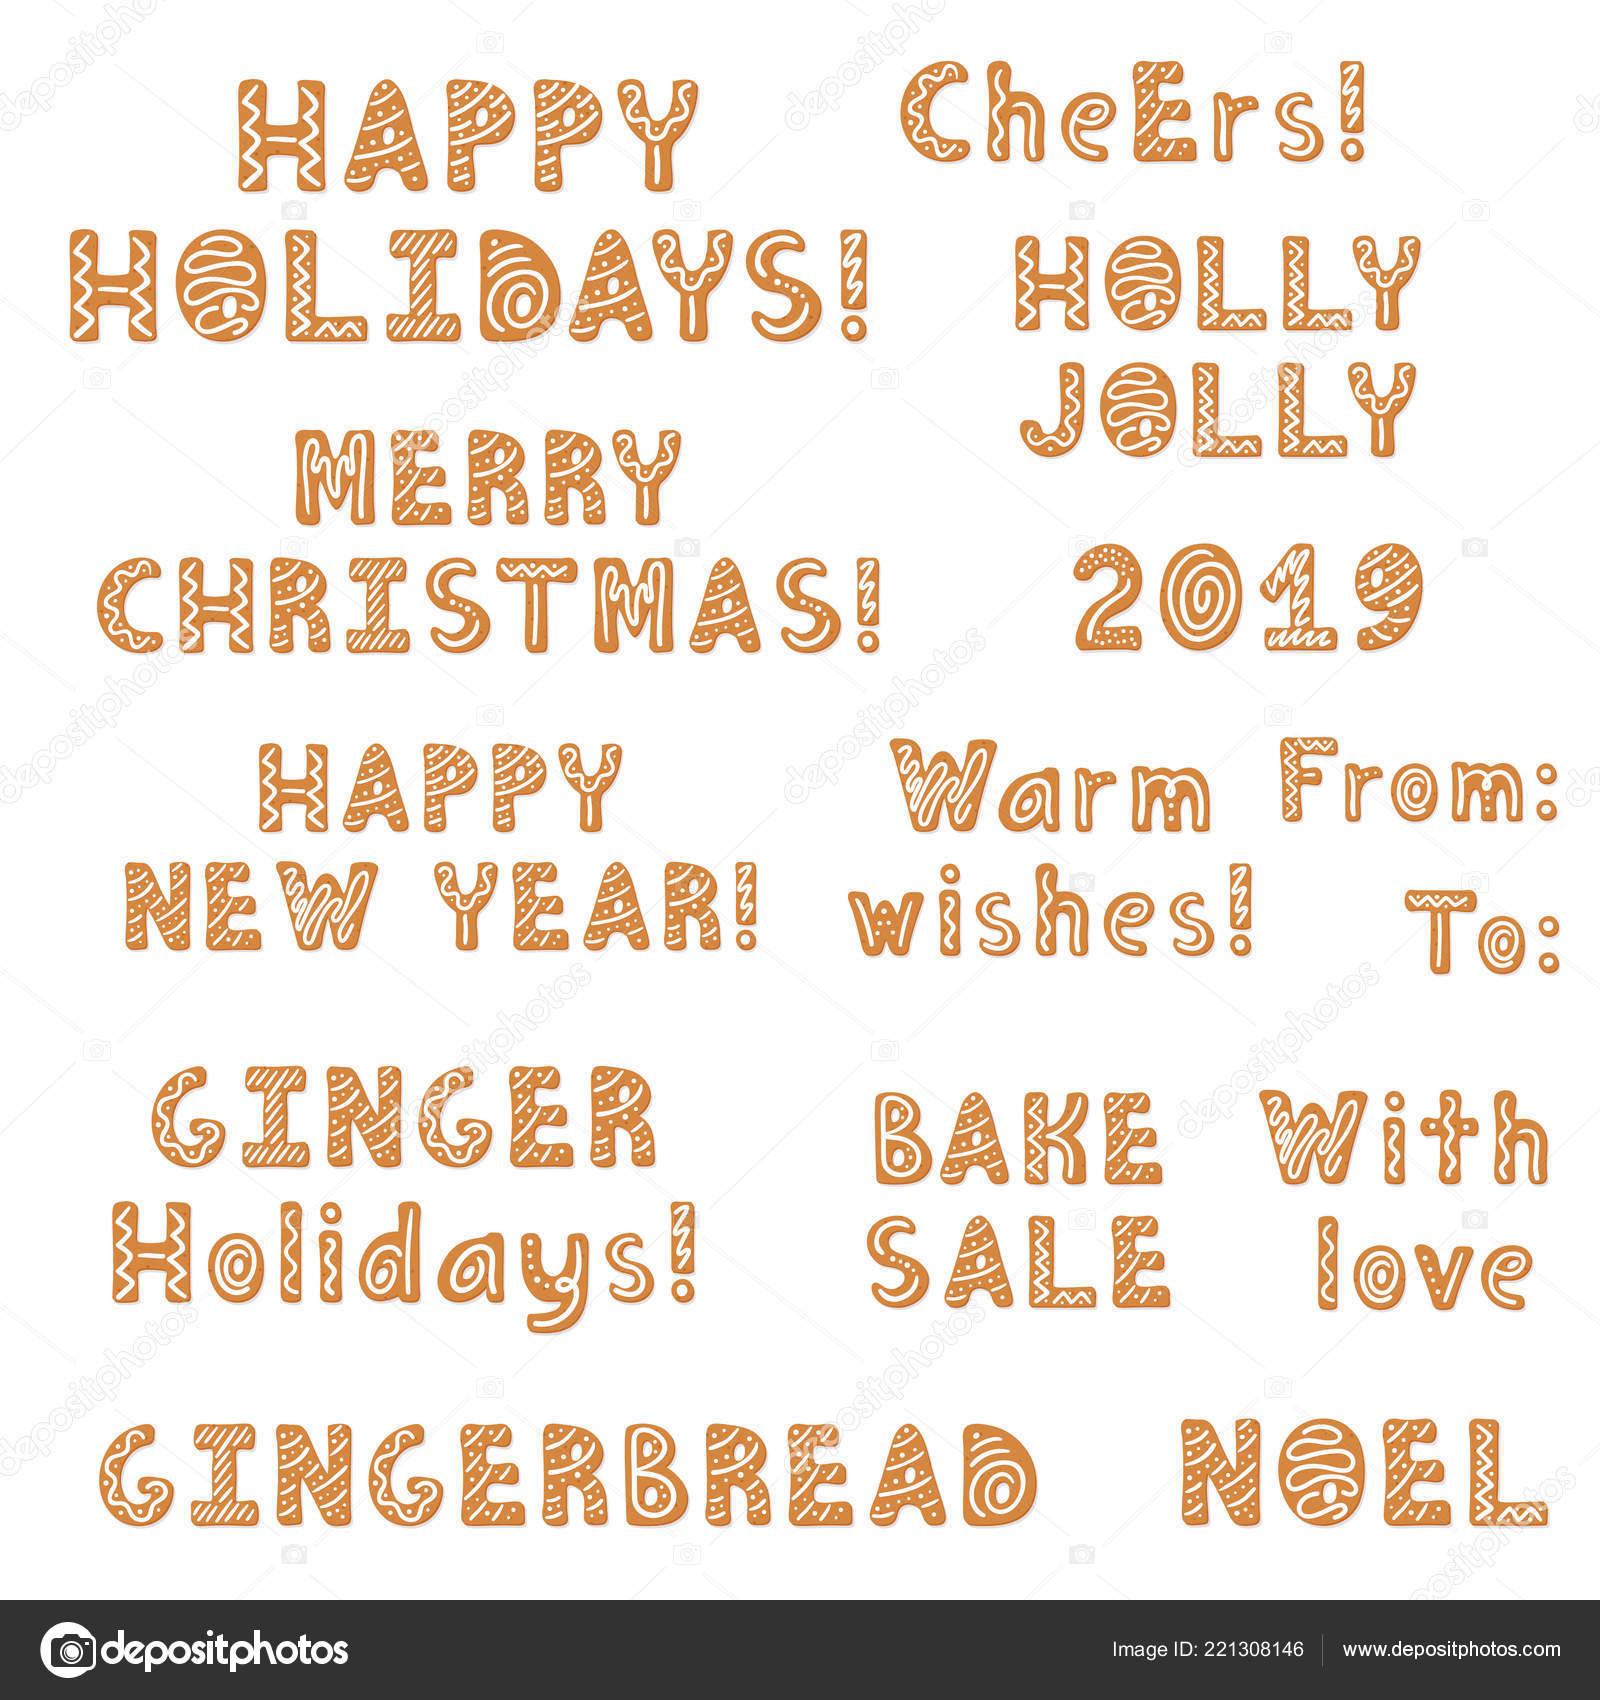 Frasi 1 Natale Insieme.Insieme Natale Biscotti Lettering Citazioni Frasi Decorati Glassa